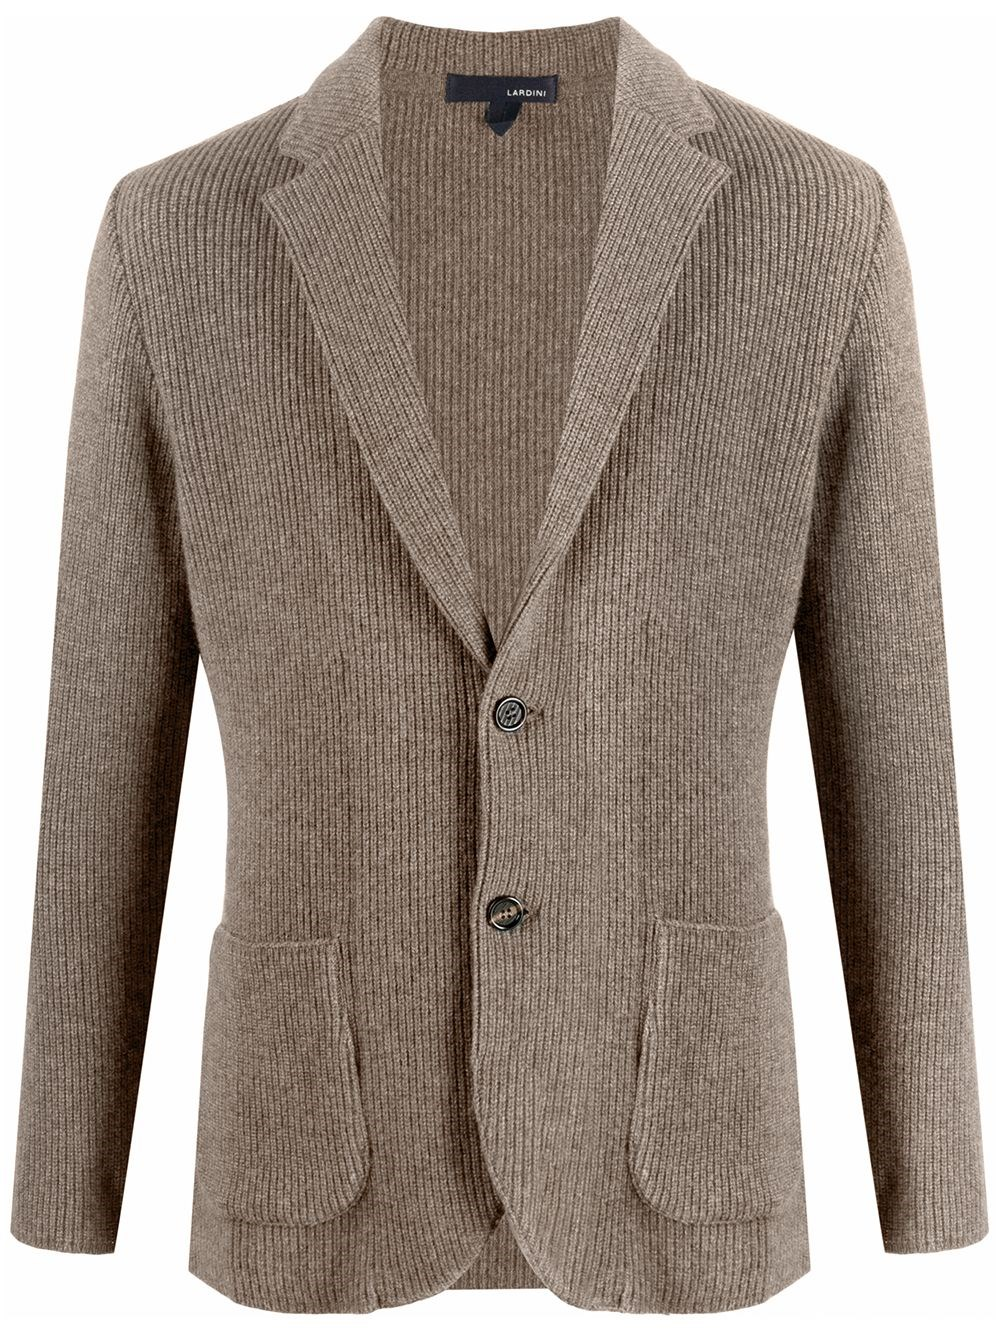 LARDINI Single-Breasted Knit Blazer